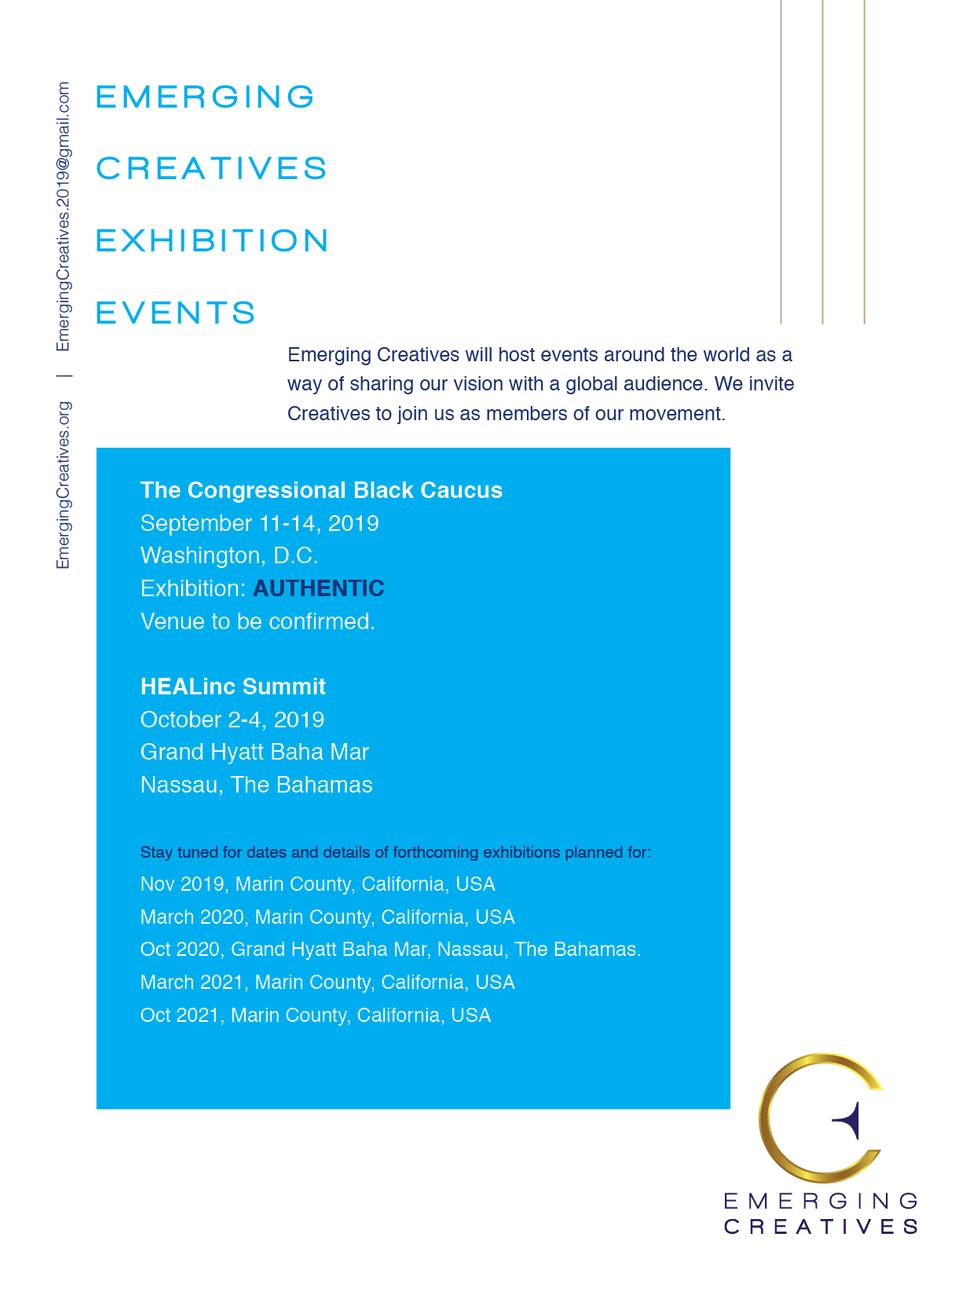 Emerging Creatives Sponsorship Exhibitio